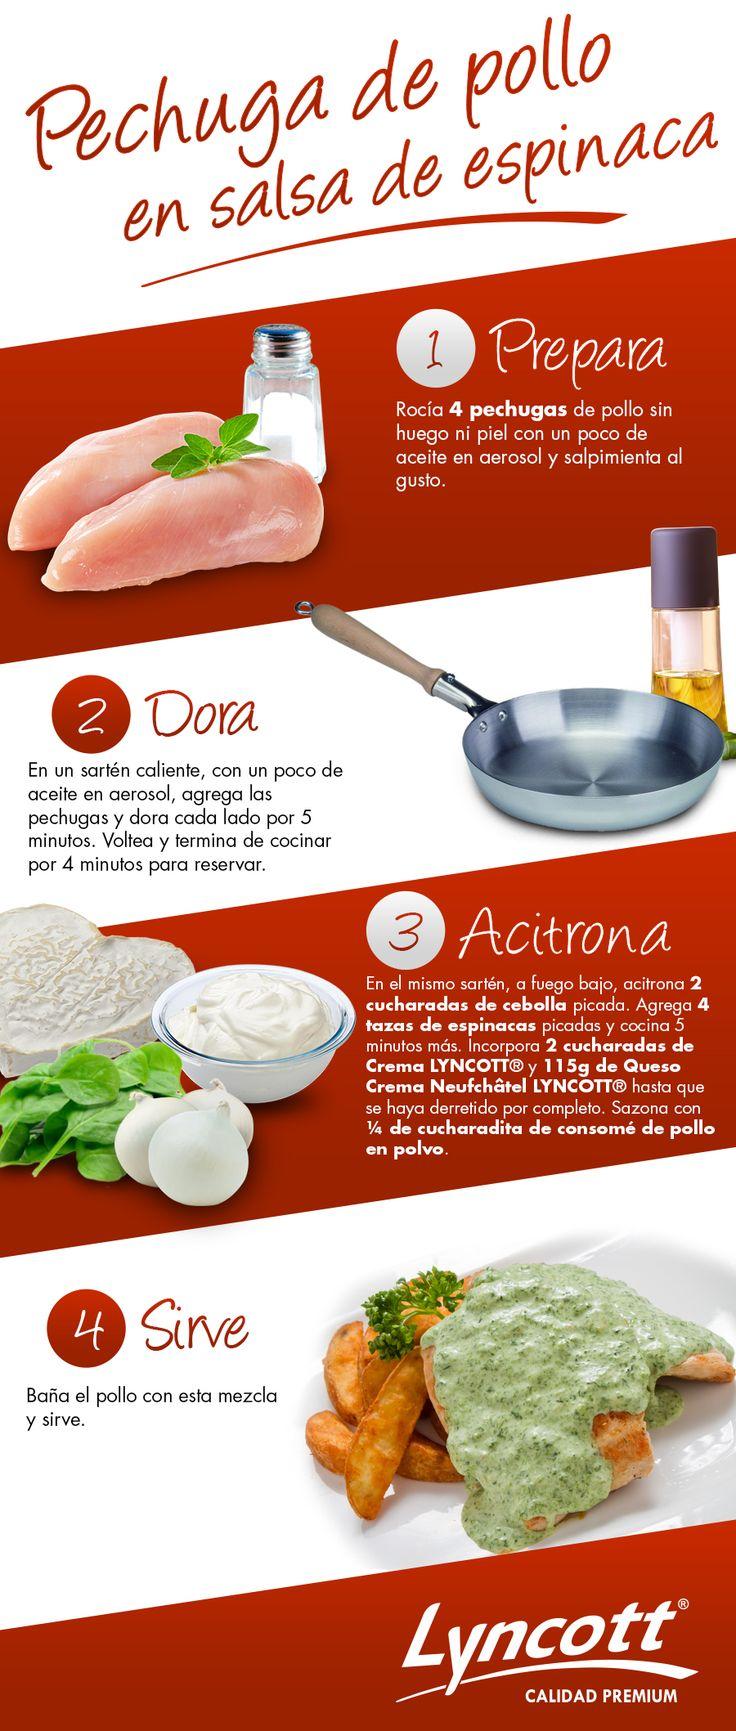 Pechuga de pollo en salsa de espinaca #RecetaFácil #Saludable #Pollo #Espinaca #Salsa